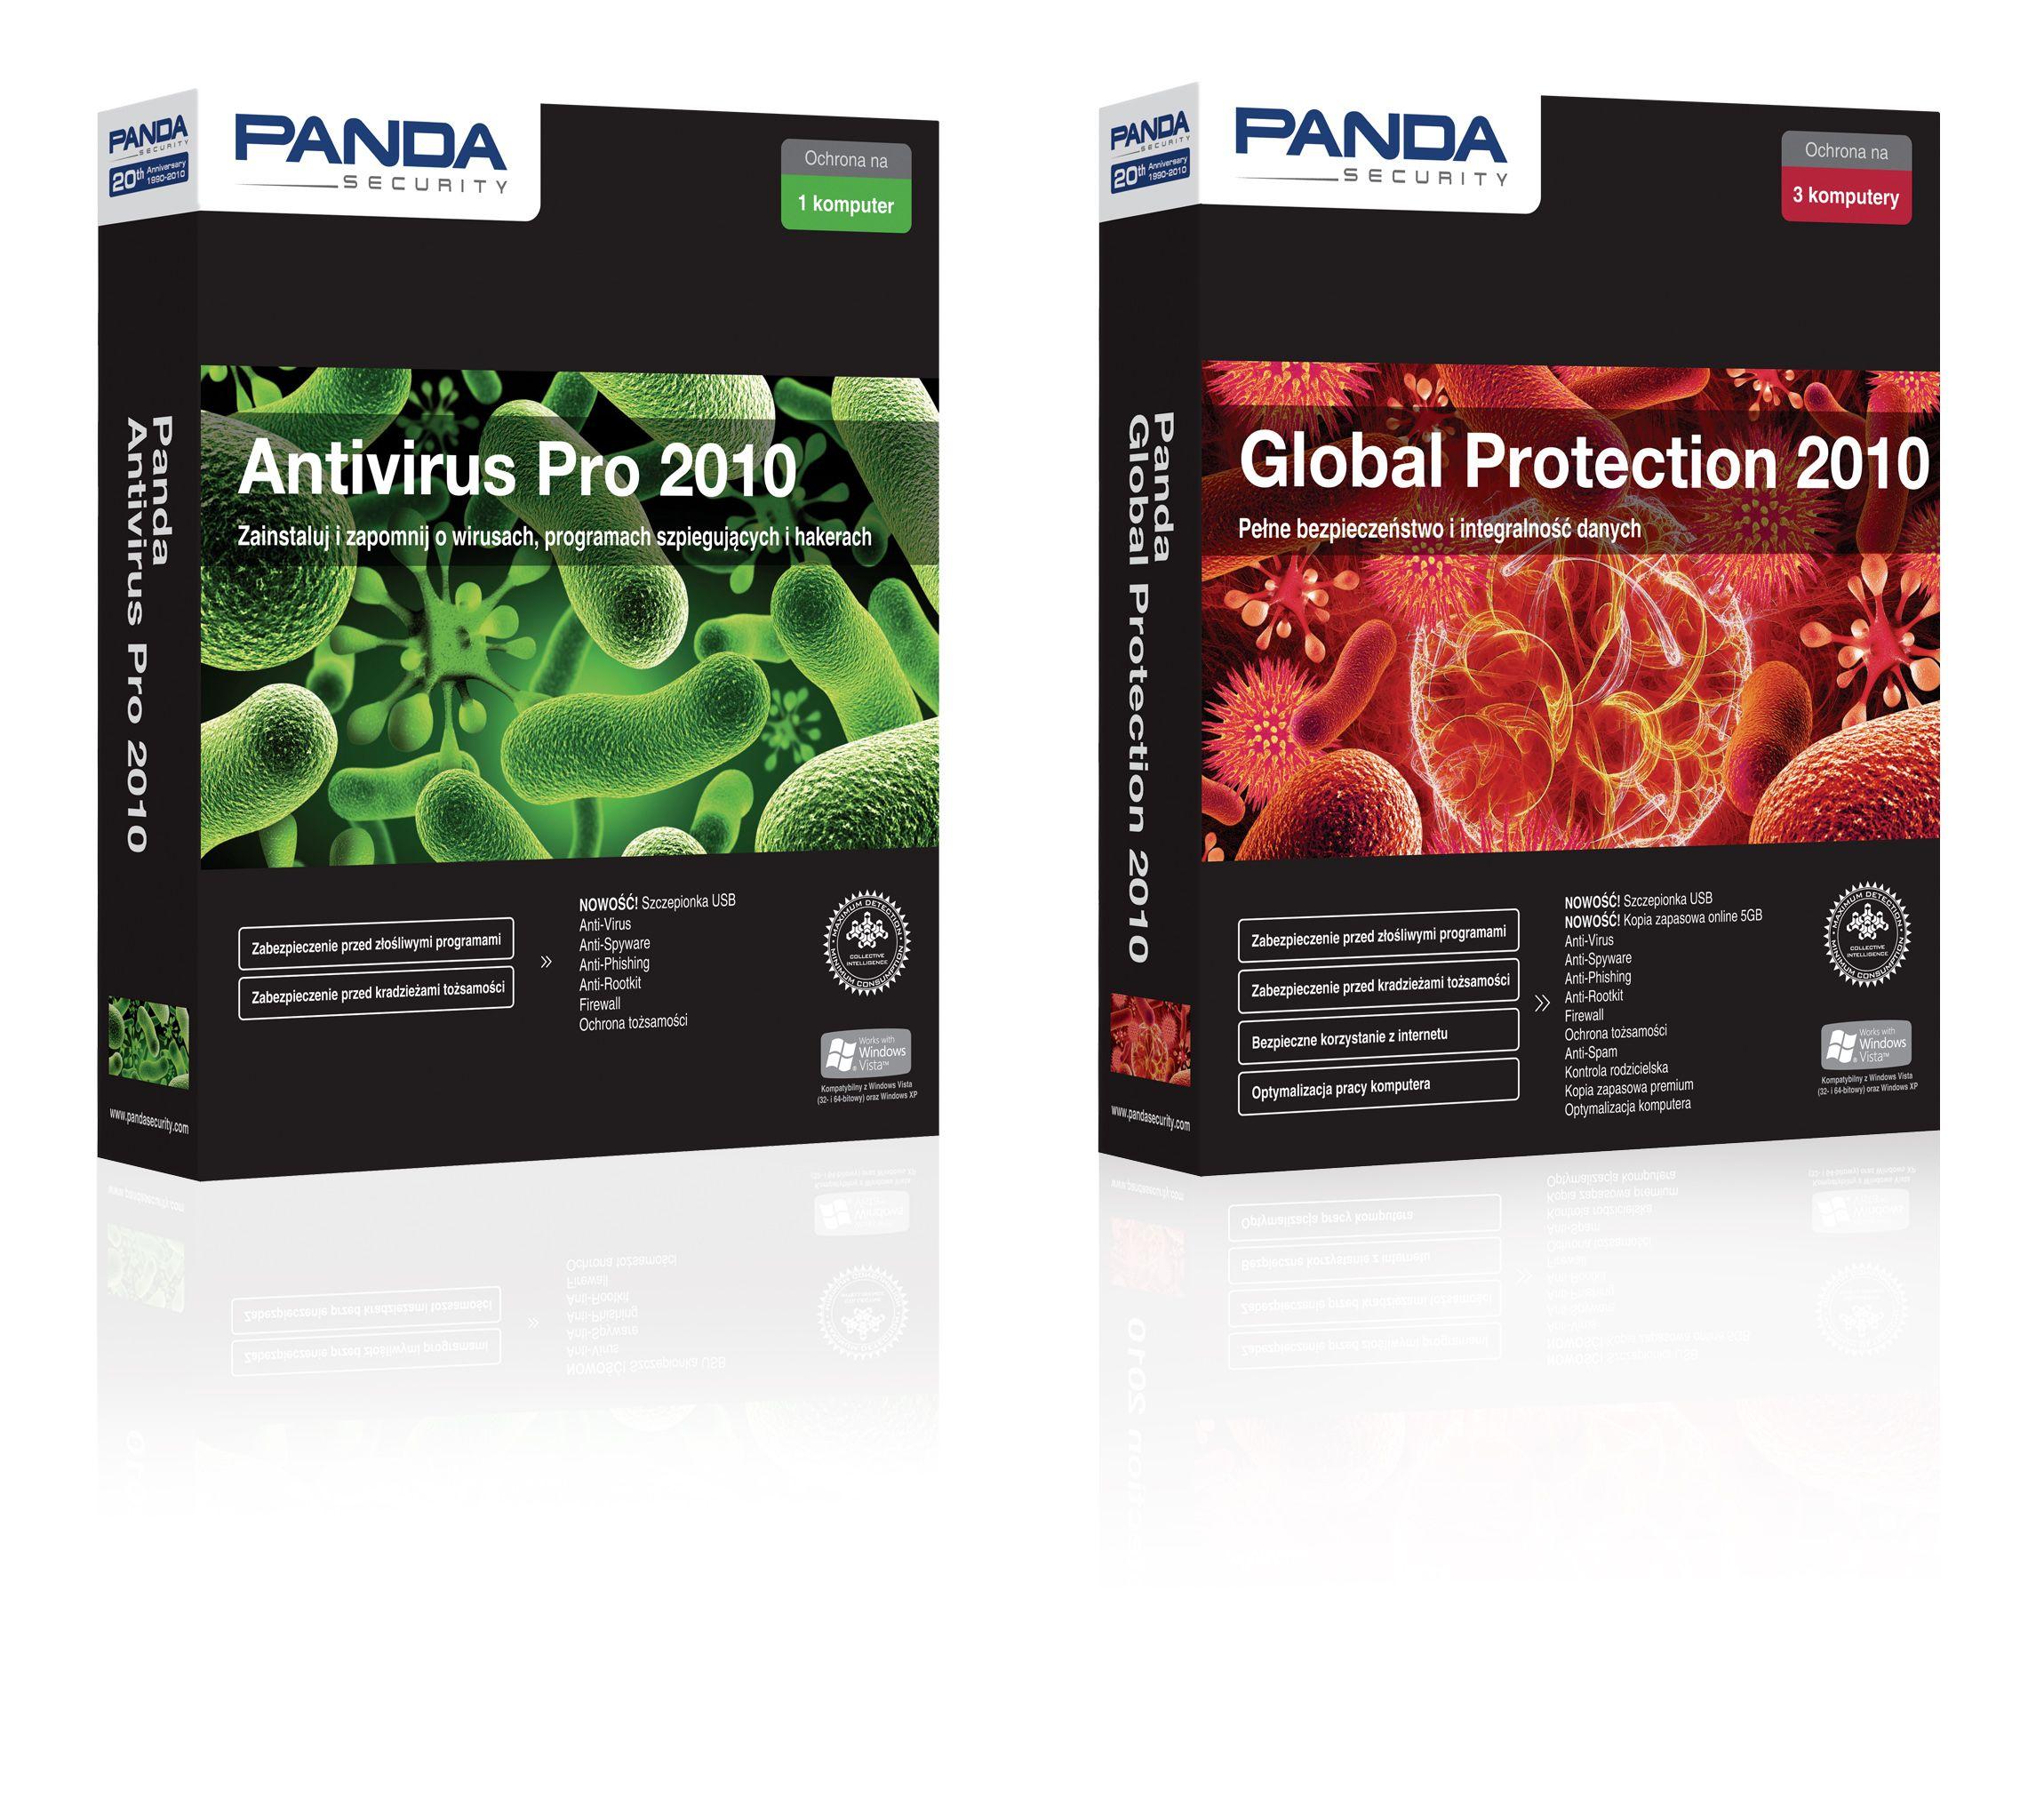 pr50_Panda-Global-Protection-2010-i-Panda-Antivirus-Pro-2010.jpg